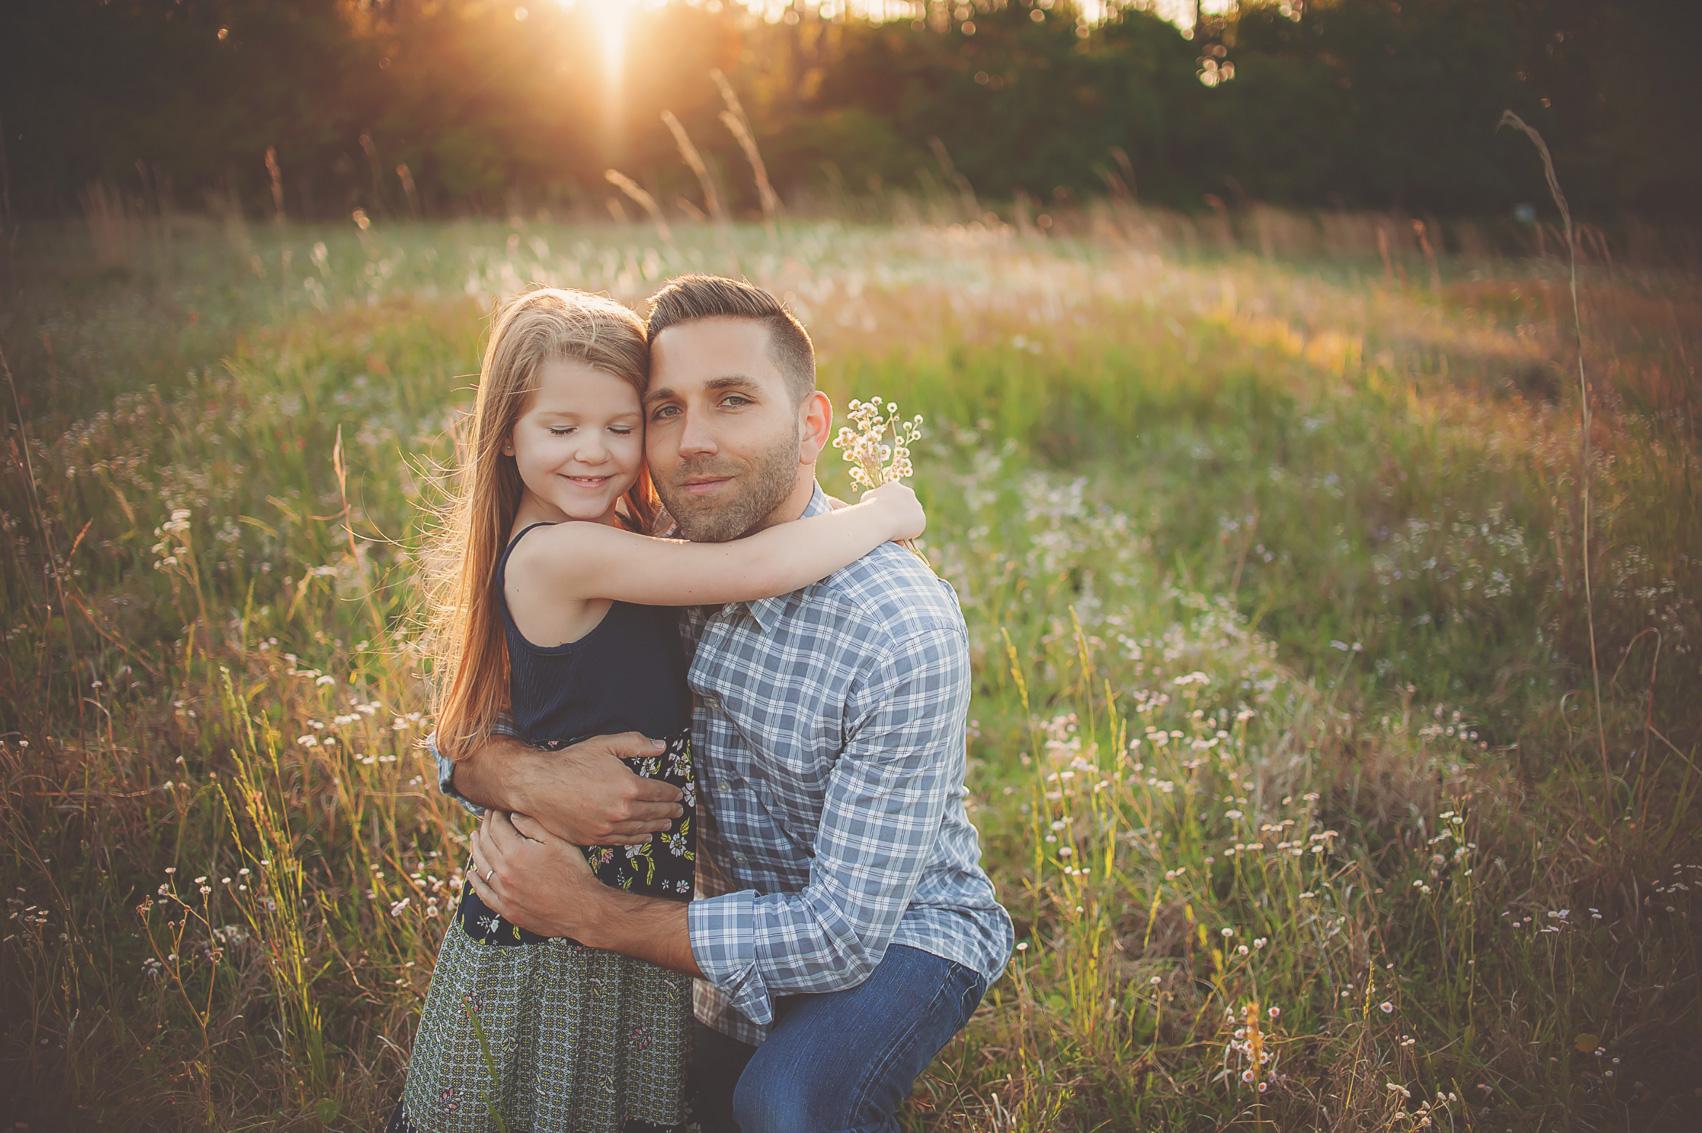 adam-szarmack-family-portraits-photography-love-10.jpg